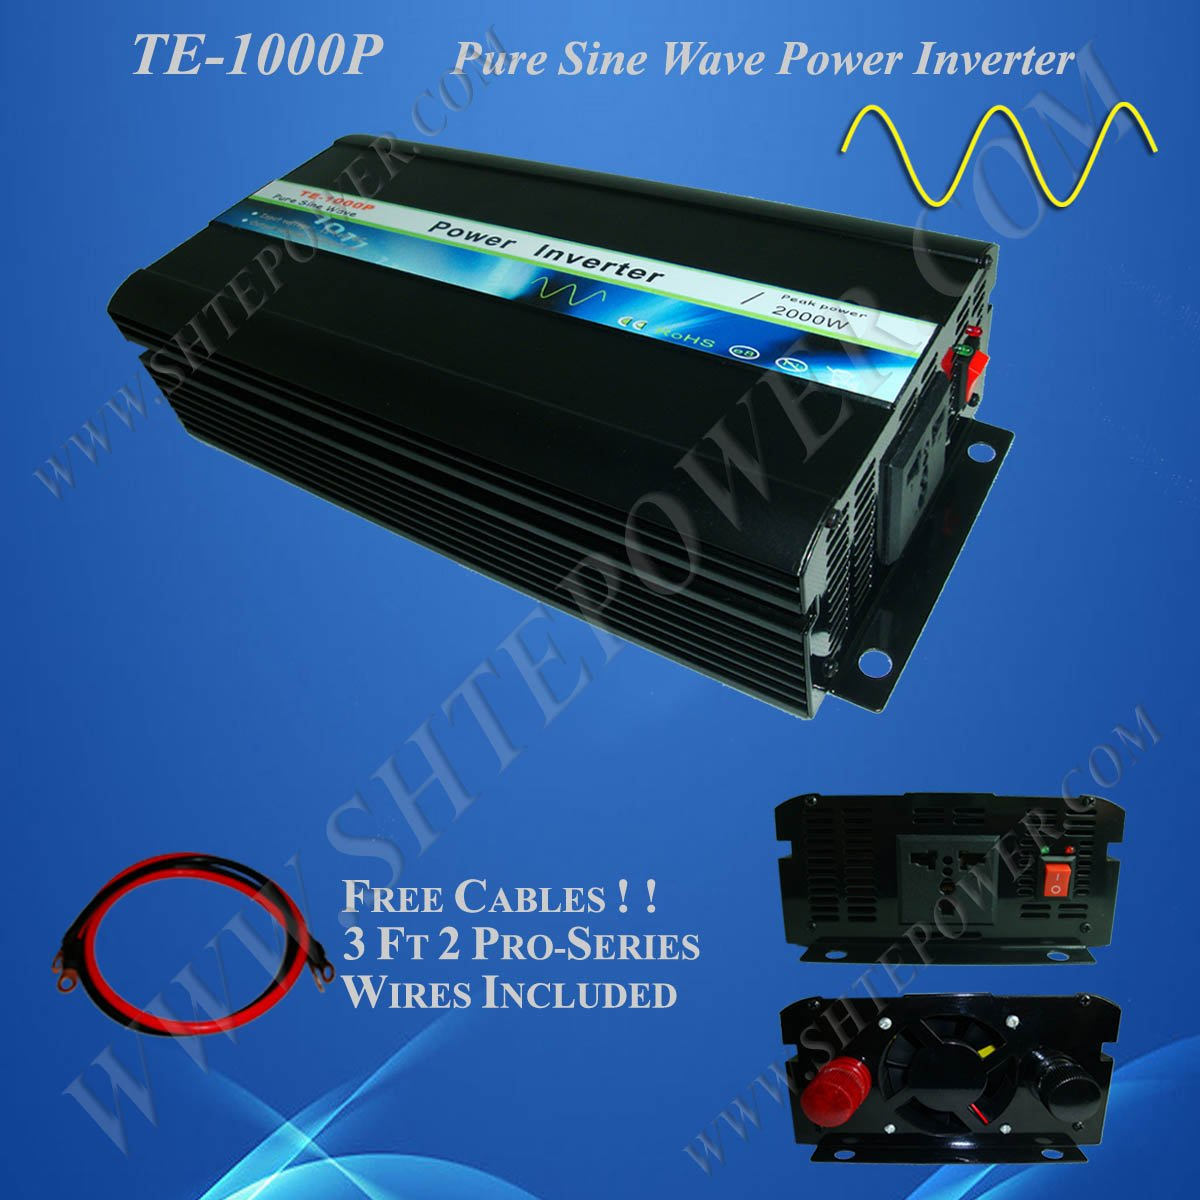 48v dc 120v ac 1000w inverter 1kw 48v inverter 48vdc to 120vac inverter hot new nf4eb 48v nf4eb 48v 48vdc dc48v dip15